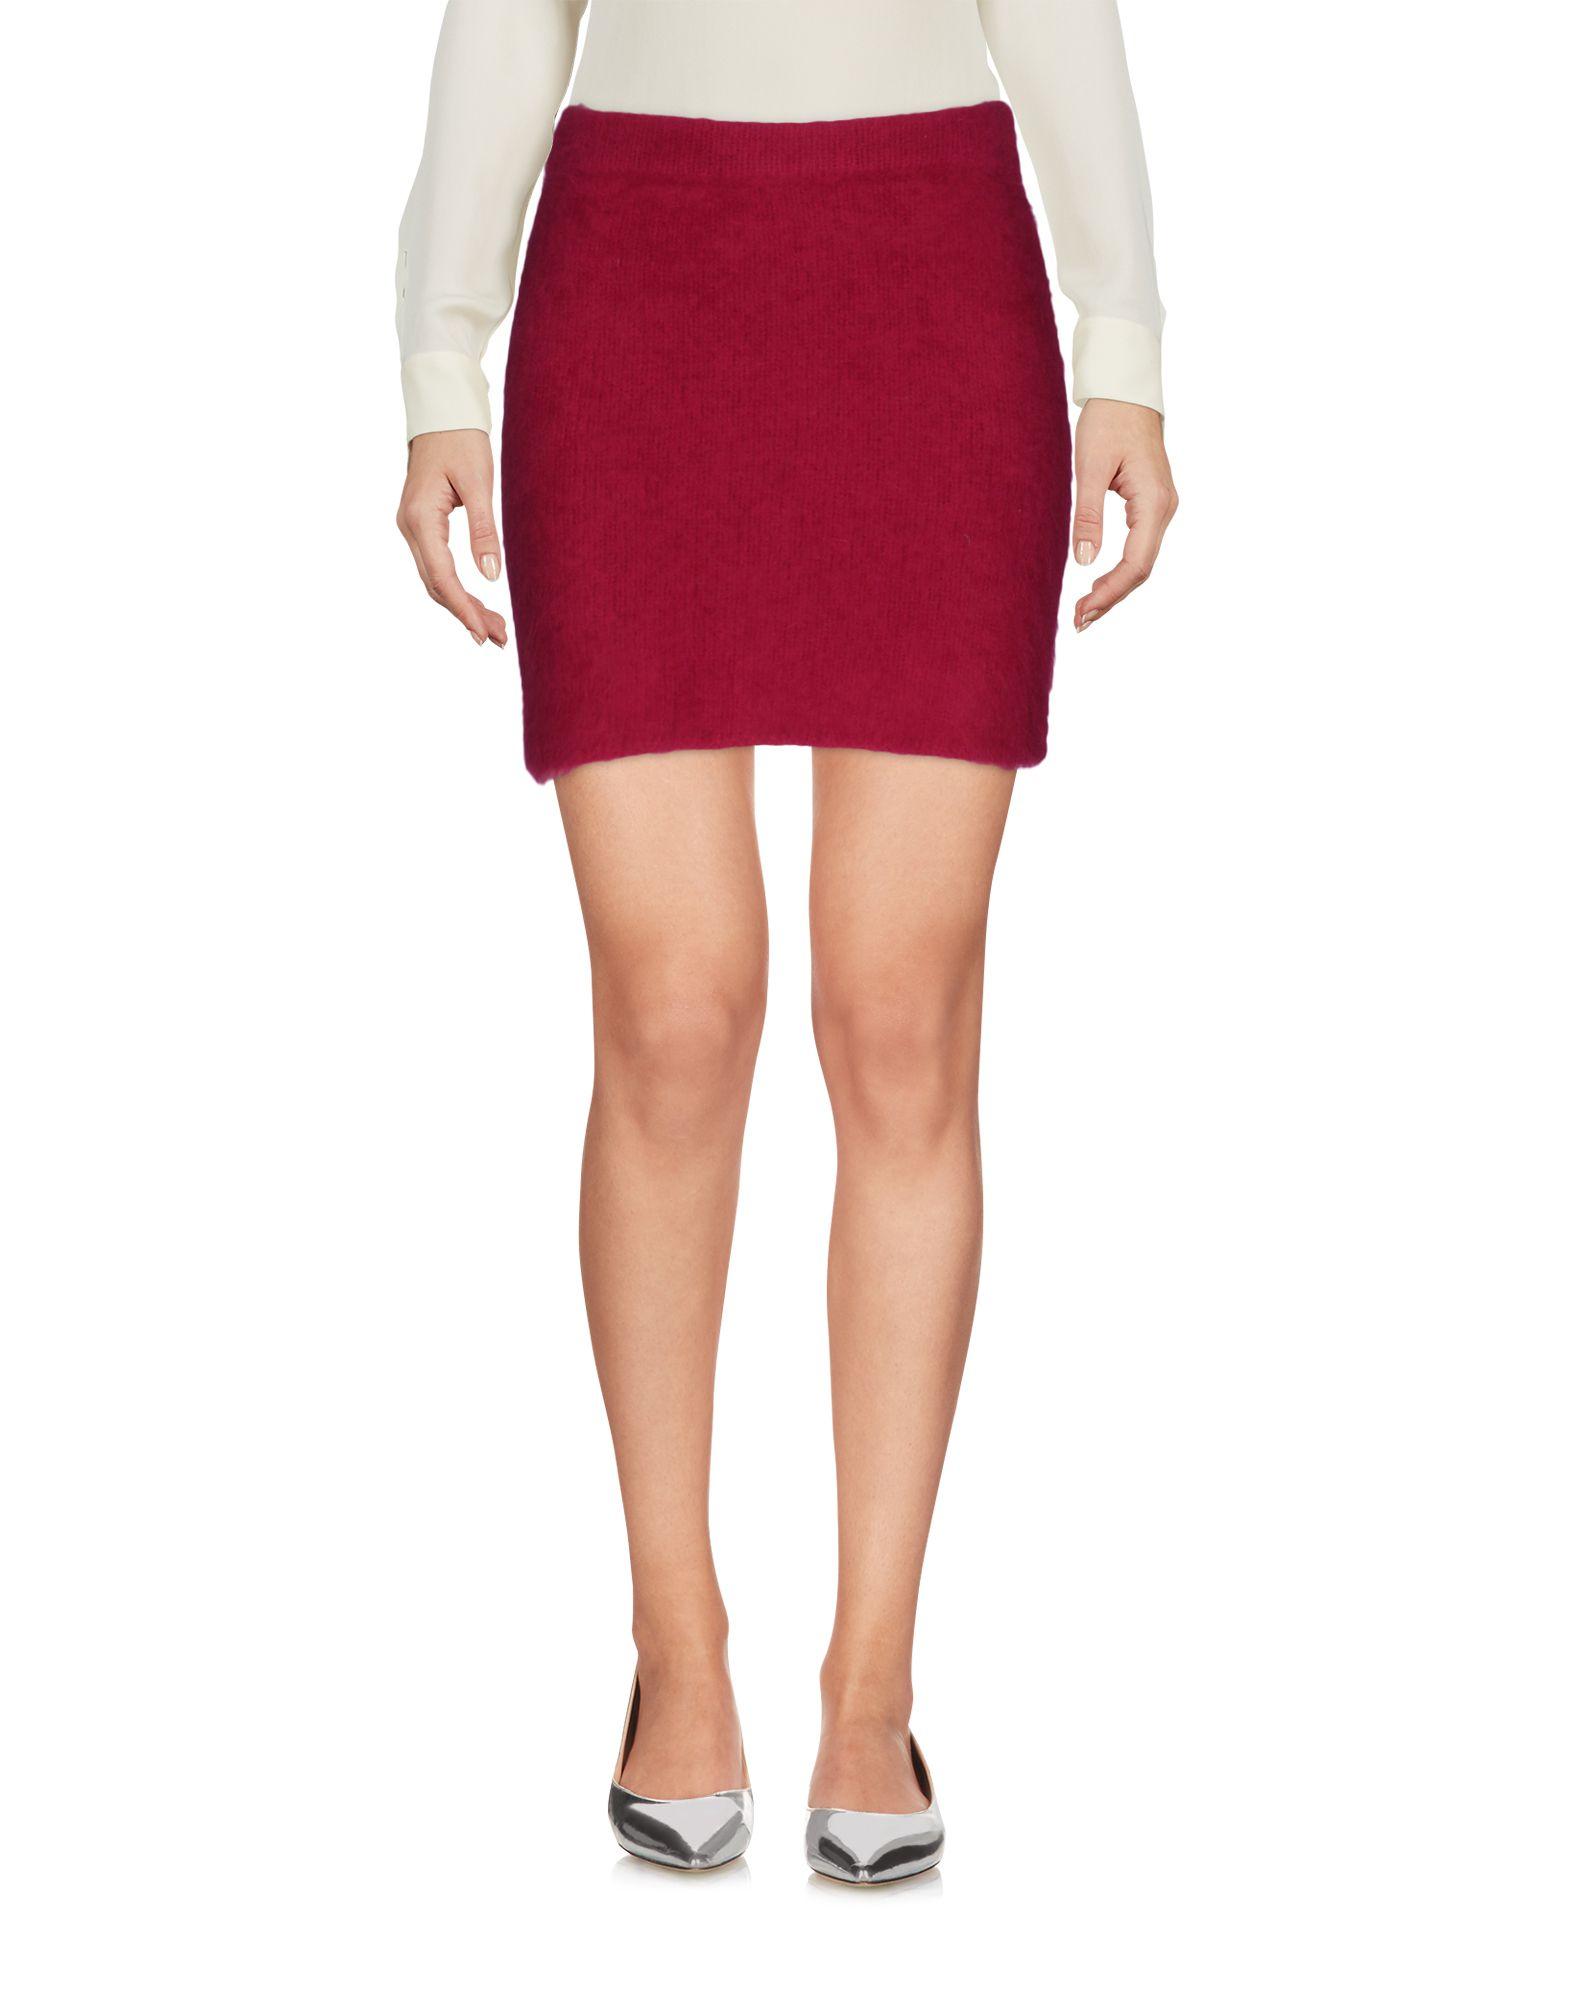 BEAYUKMUI Mini Skirt in Fuchsia